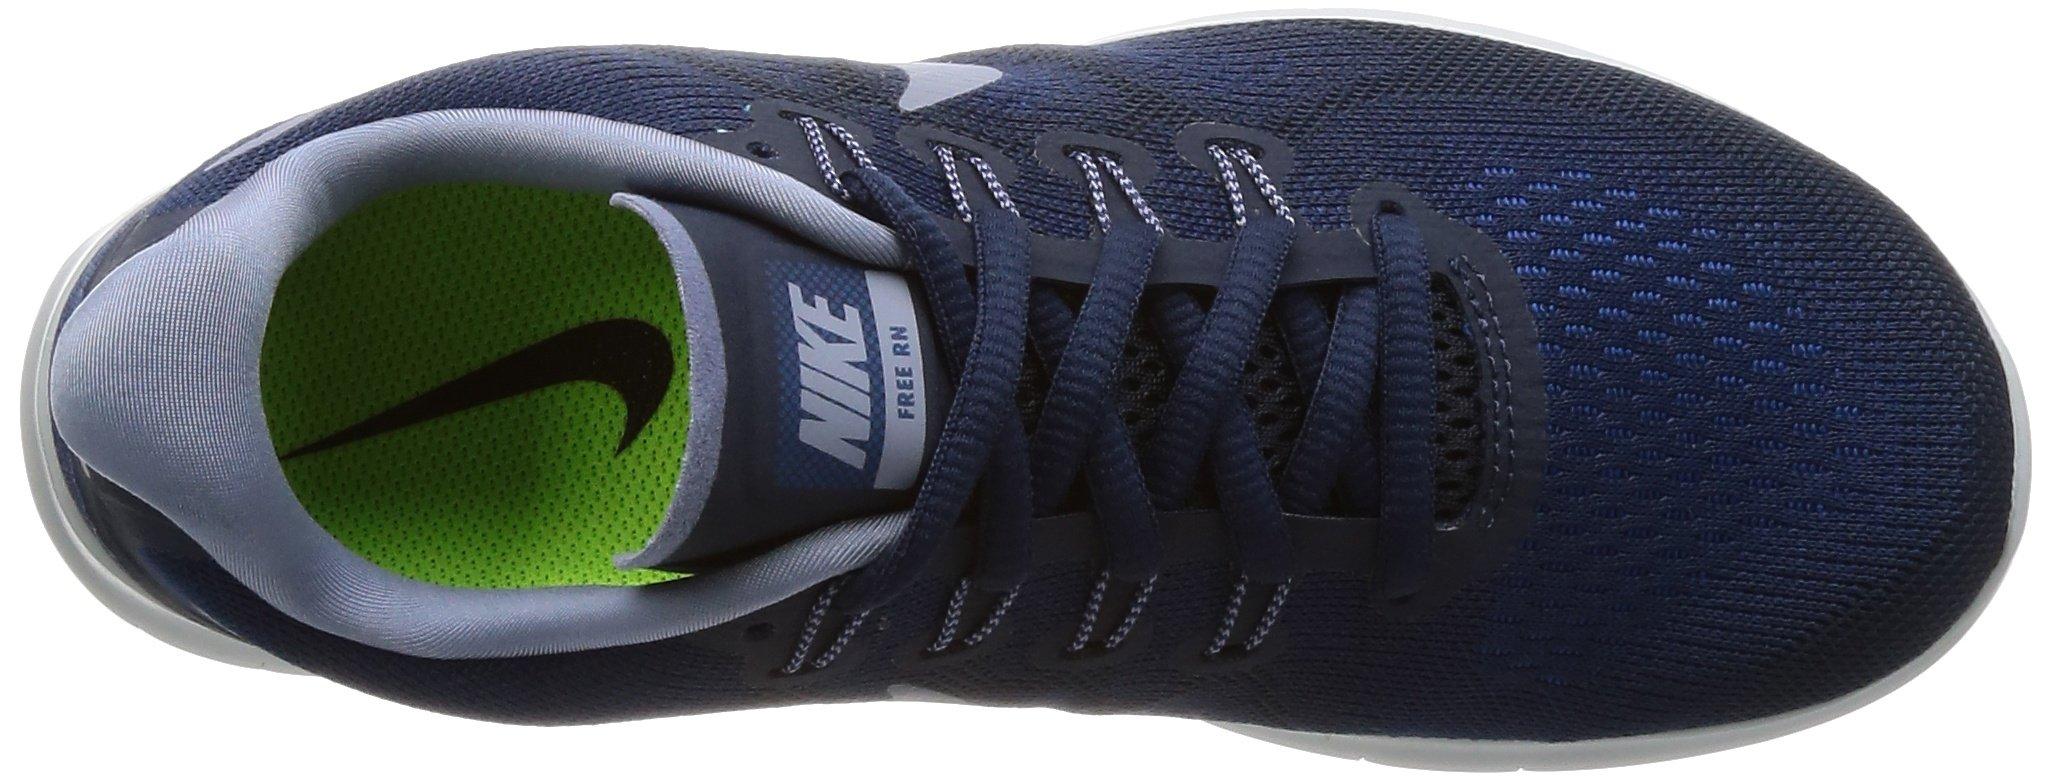 Nike Free RN 2017 Women's Running Shoes (6 M US, Binary Blue/Dark Sky Blue) by Nike (Image #7)